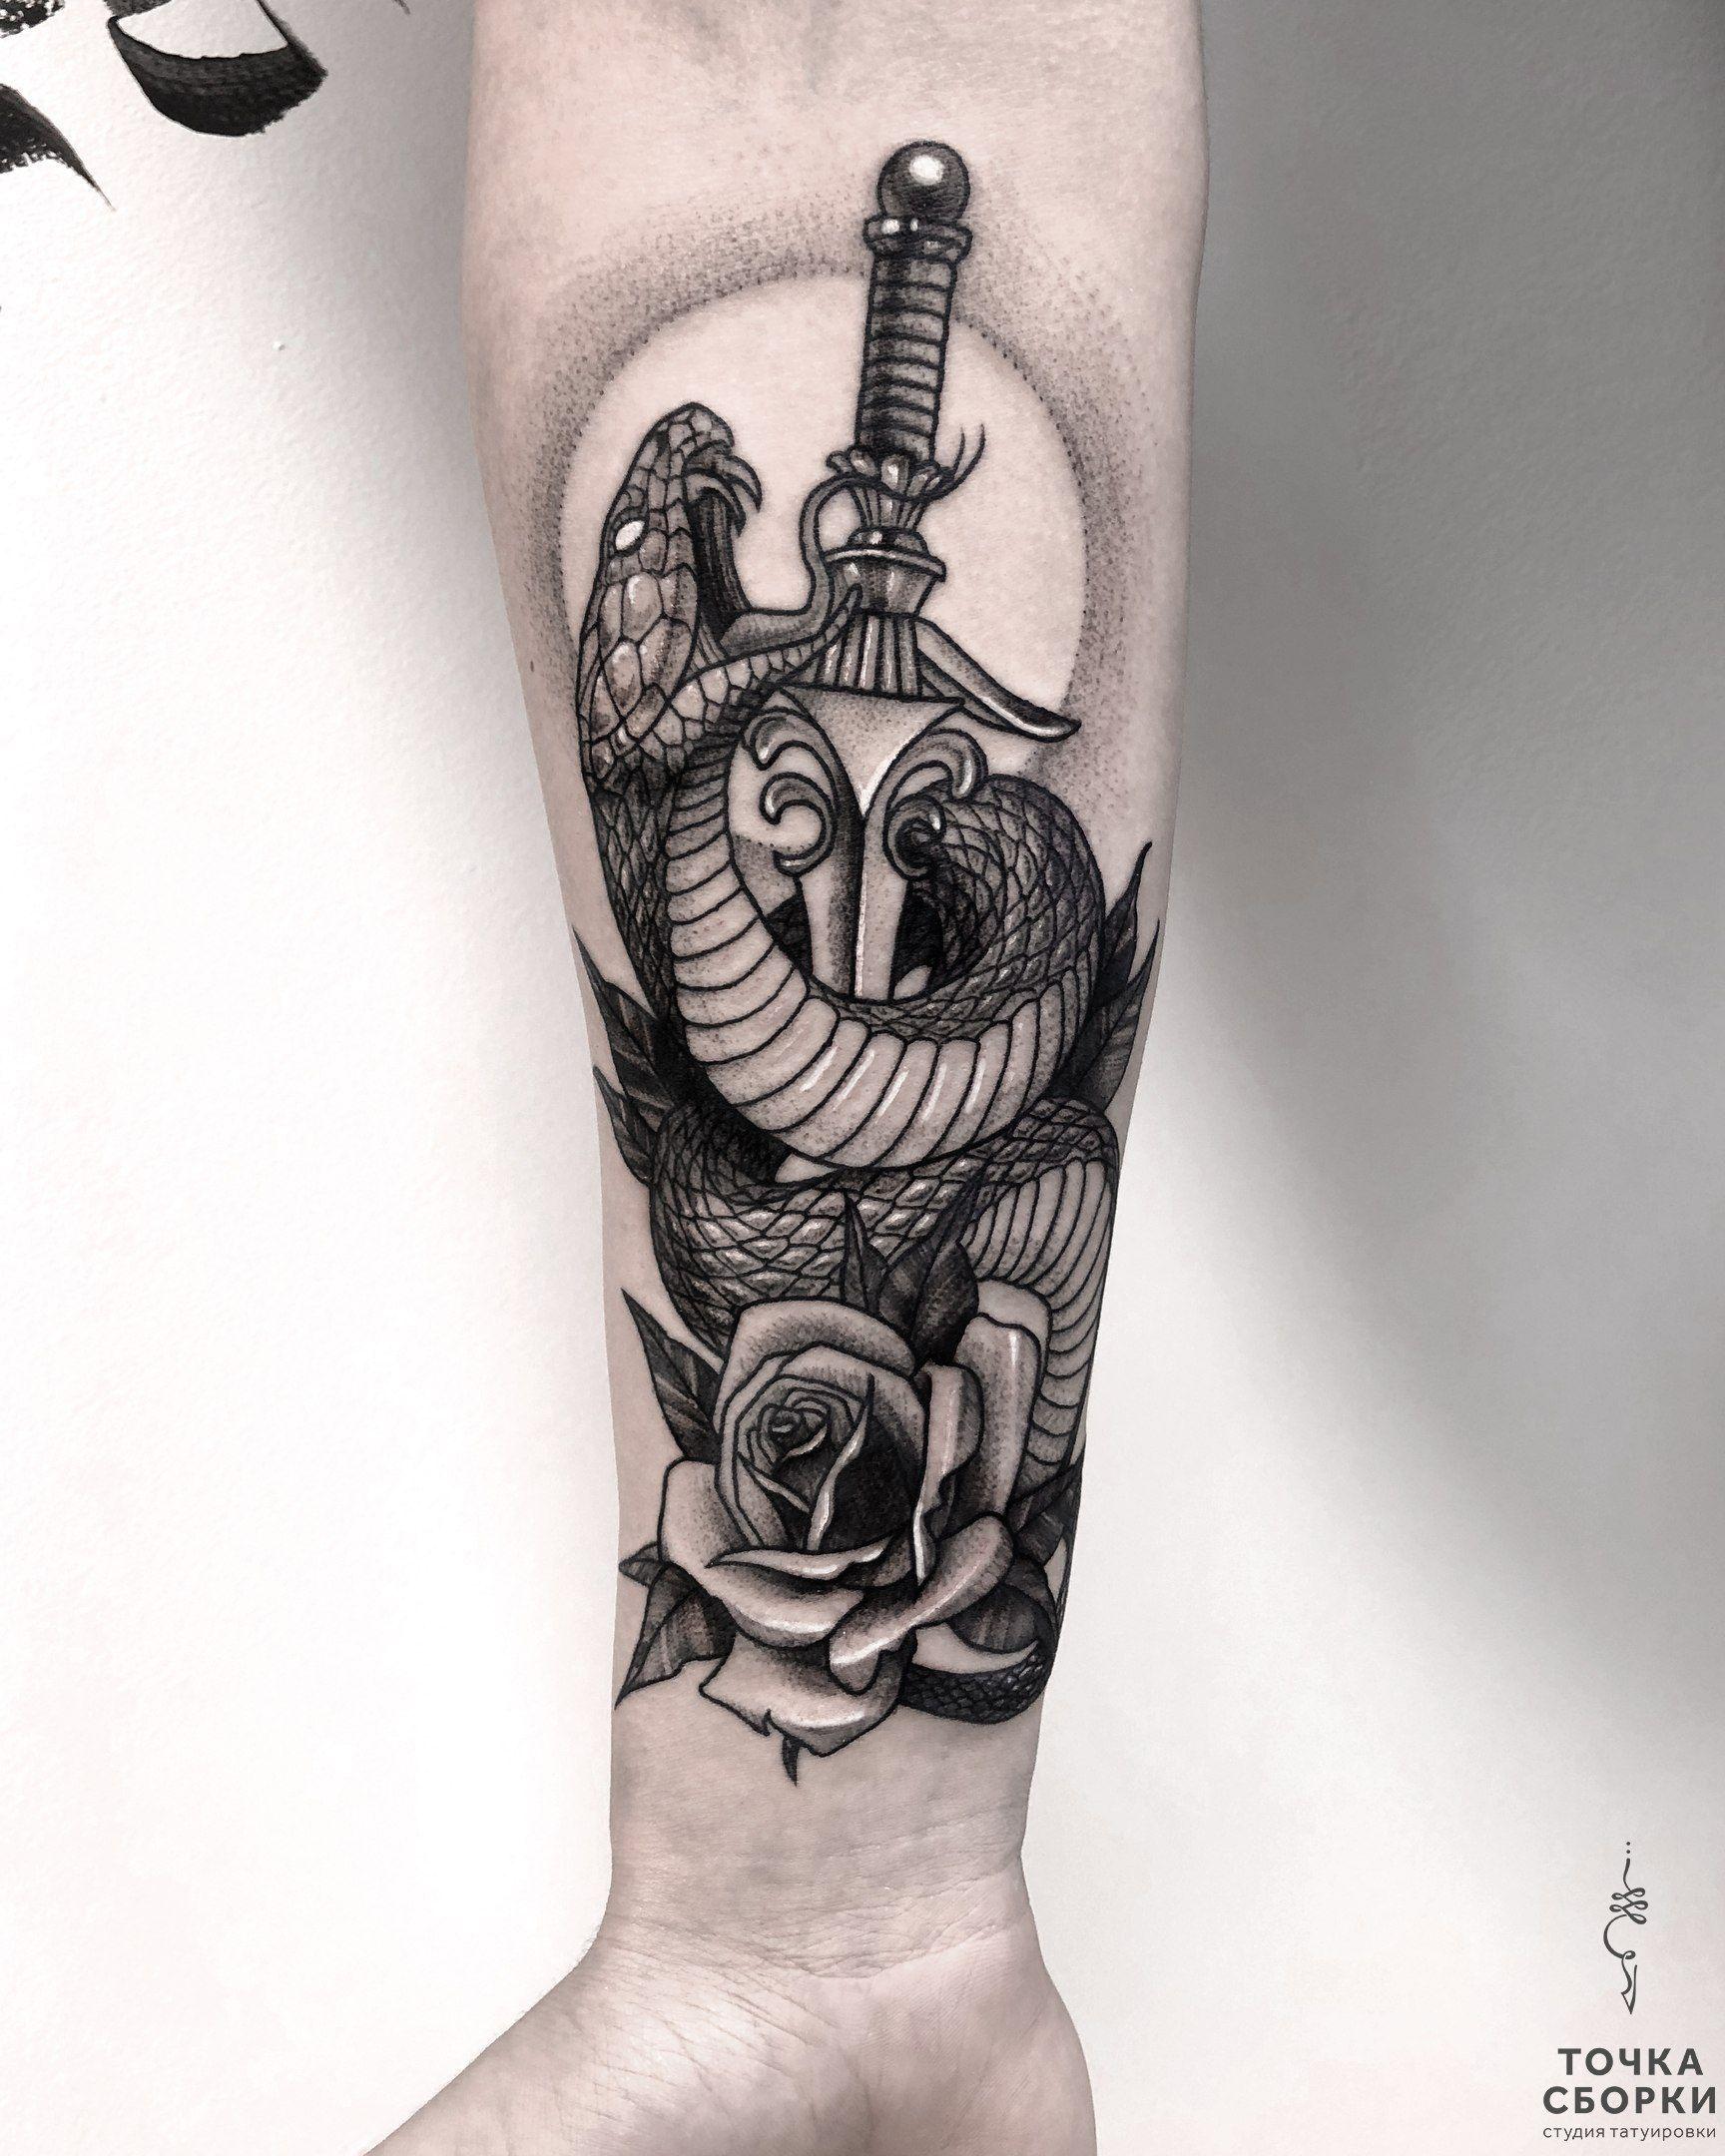 Cerave For Tattoos : cerave, tattoos, Tattoo, Irina, Fedorenko, #fedorenko, #Foto, #irina, #tattoo, Tatuagem, Cobra,, Tatuagem,, Tinta